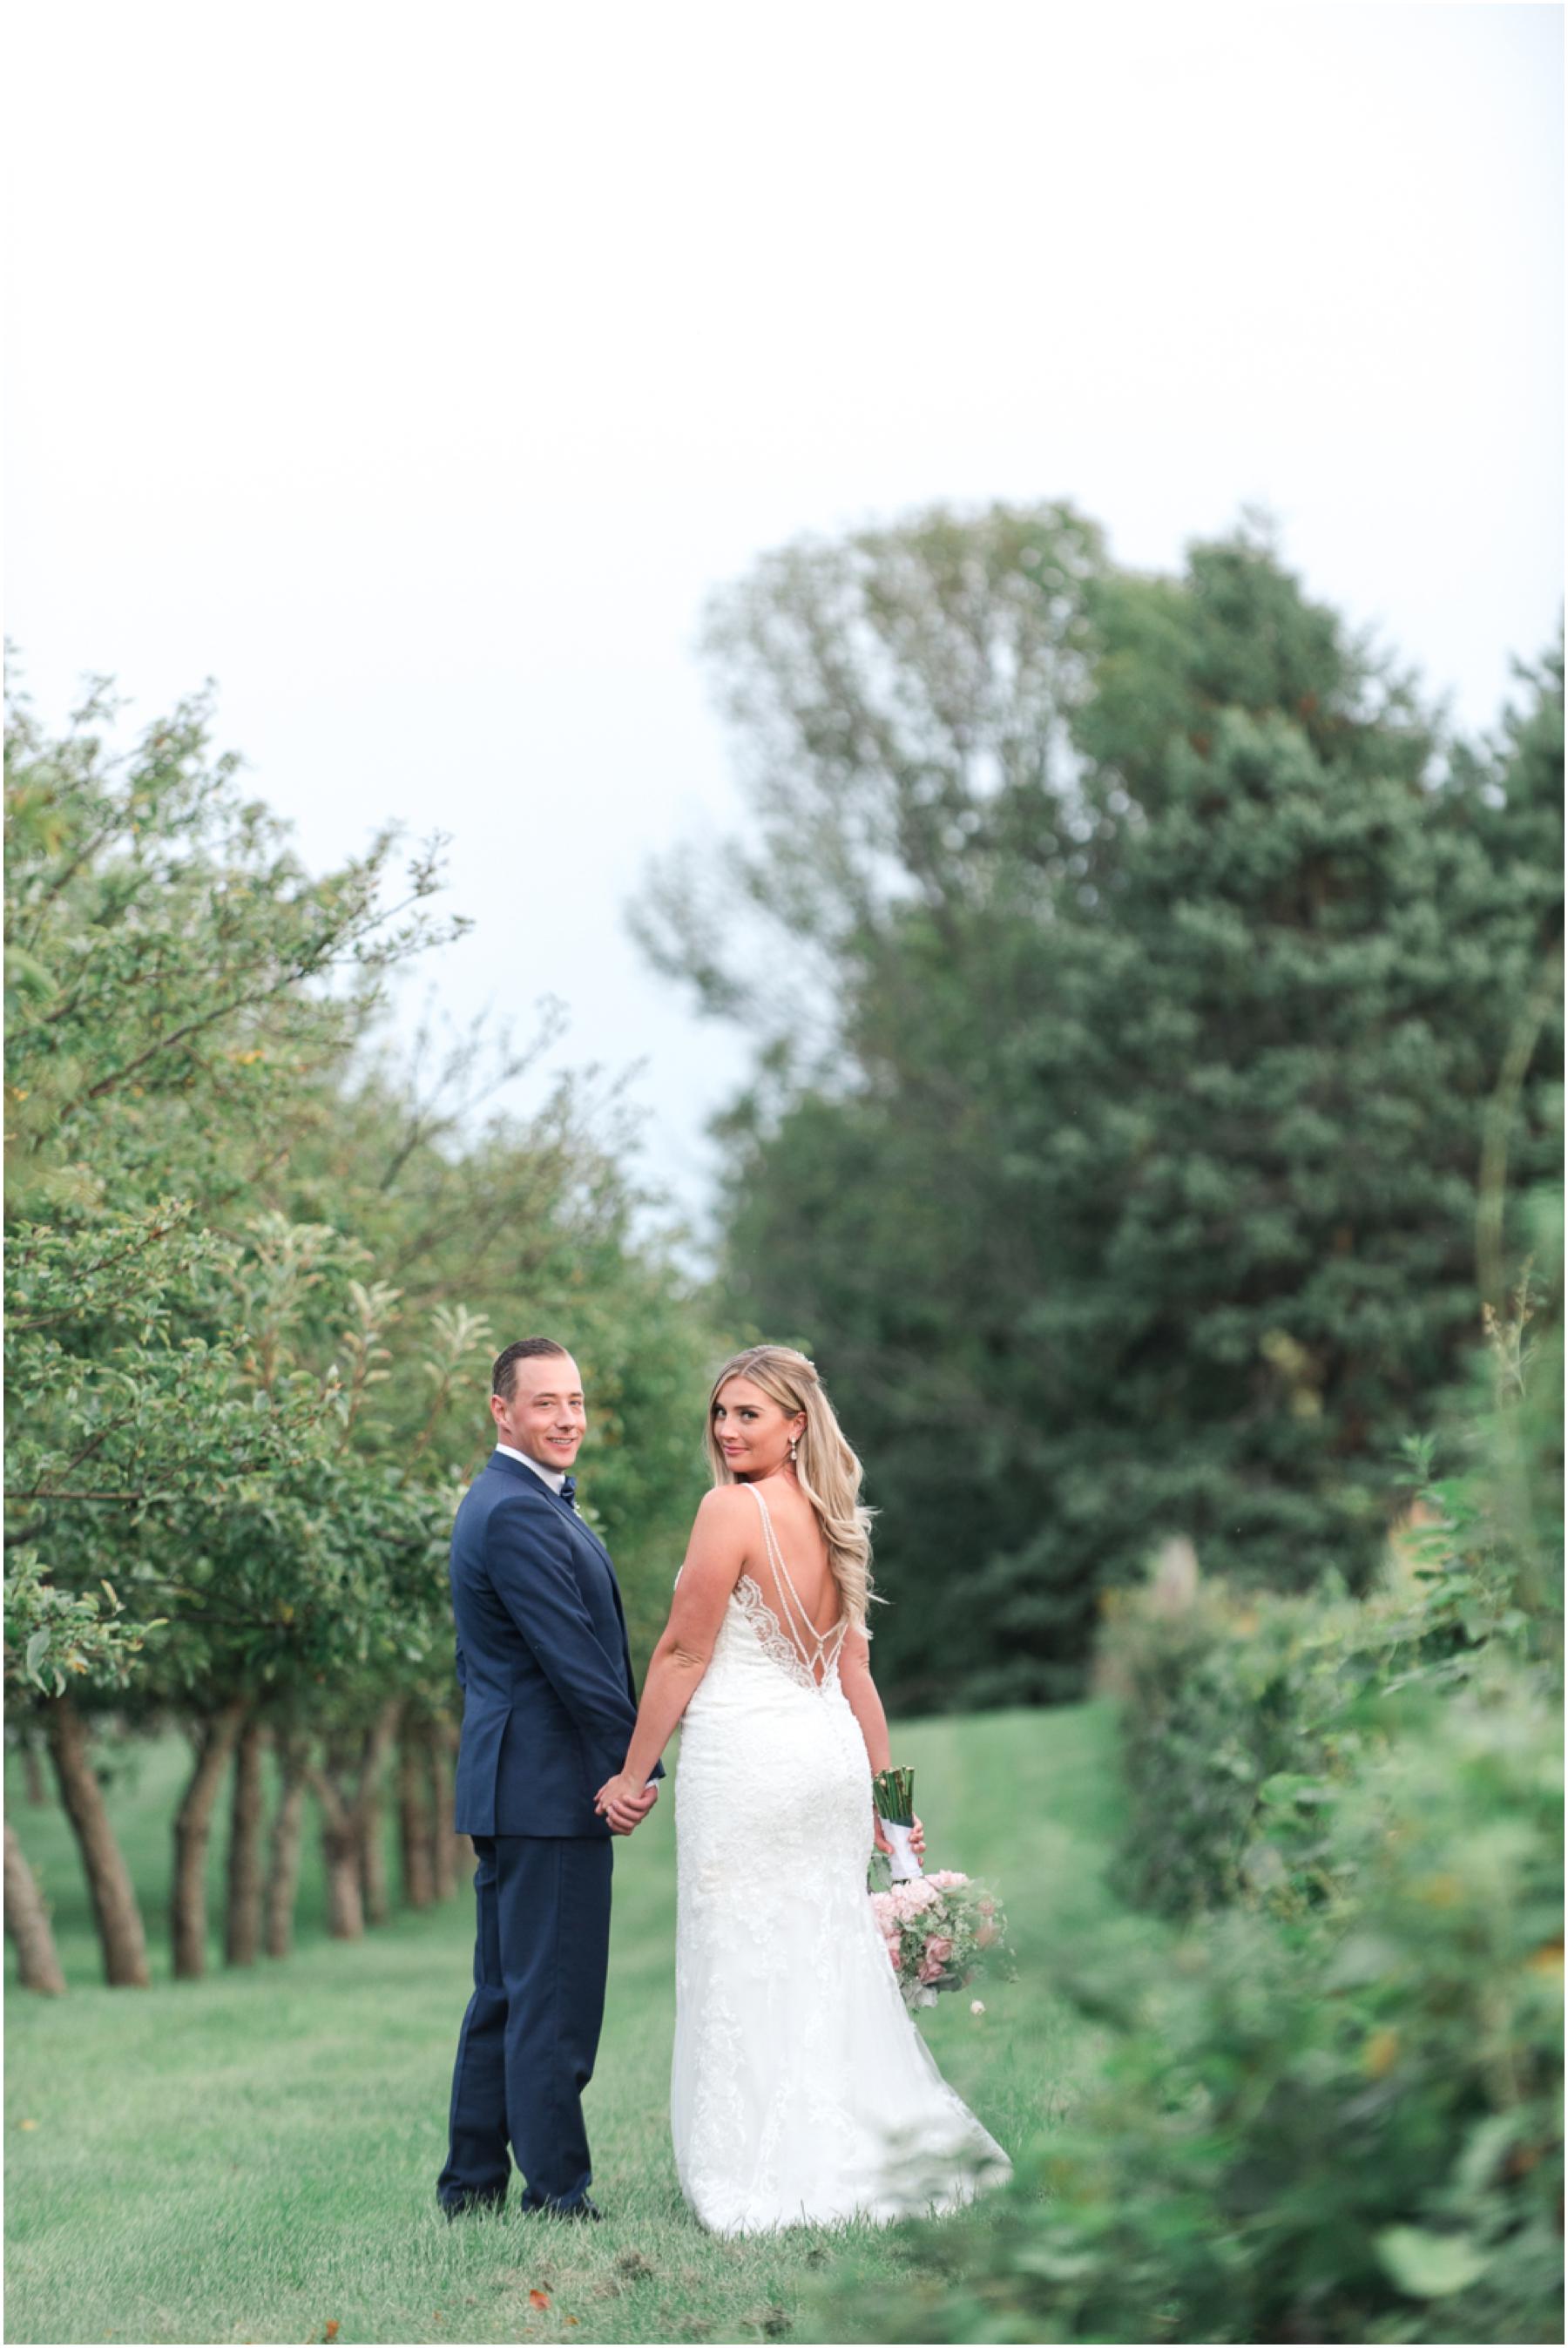 Bloom Field Gardens Wedding Precious Photography Katherine & Chris_093